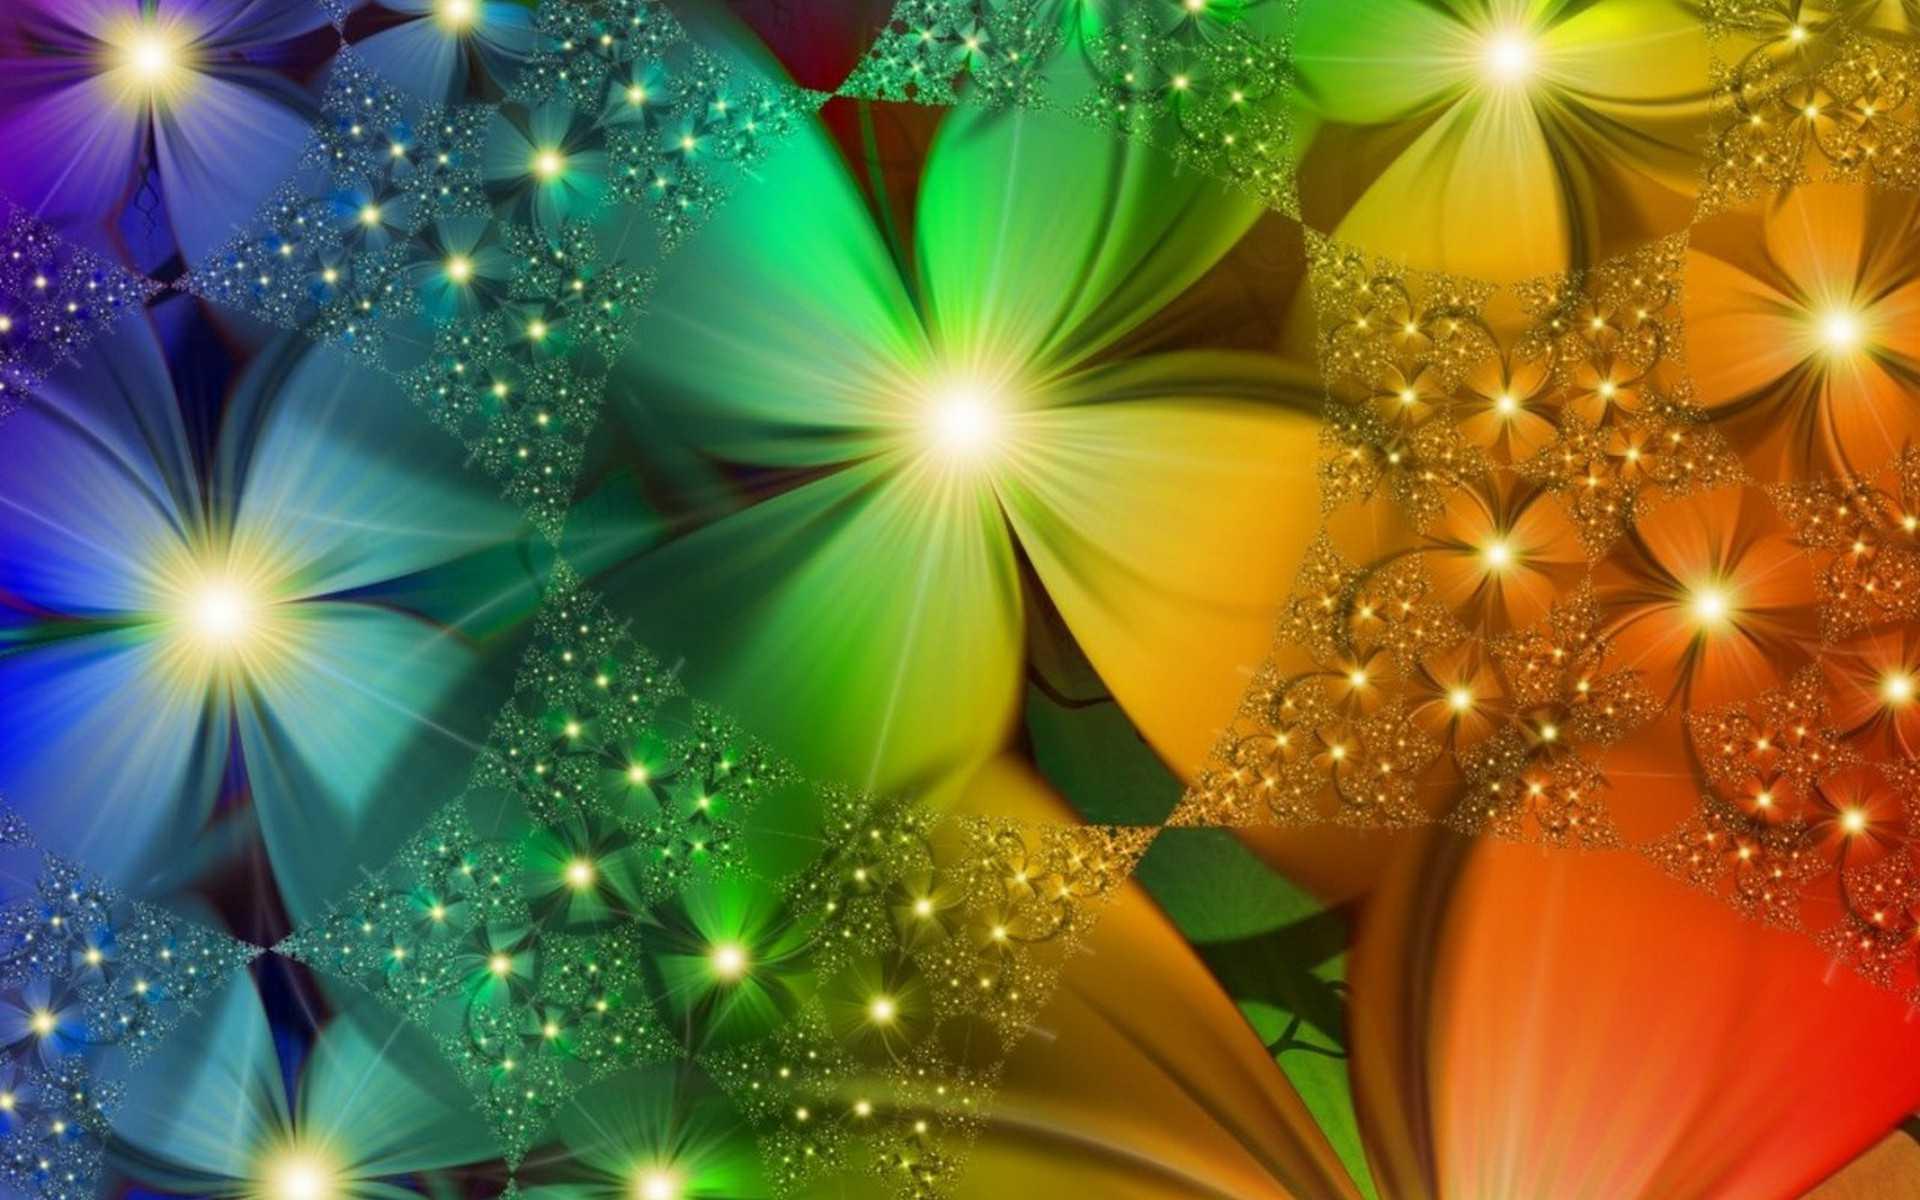 natural colorful 3d desktop wallpaper - photo #9